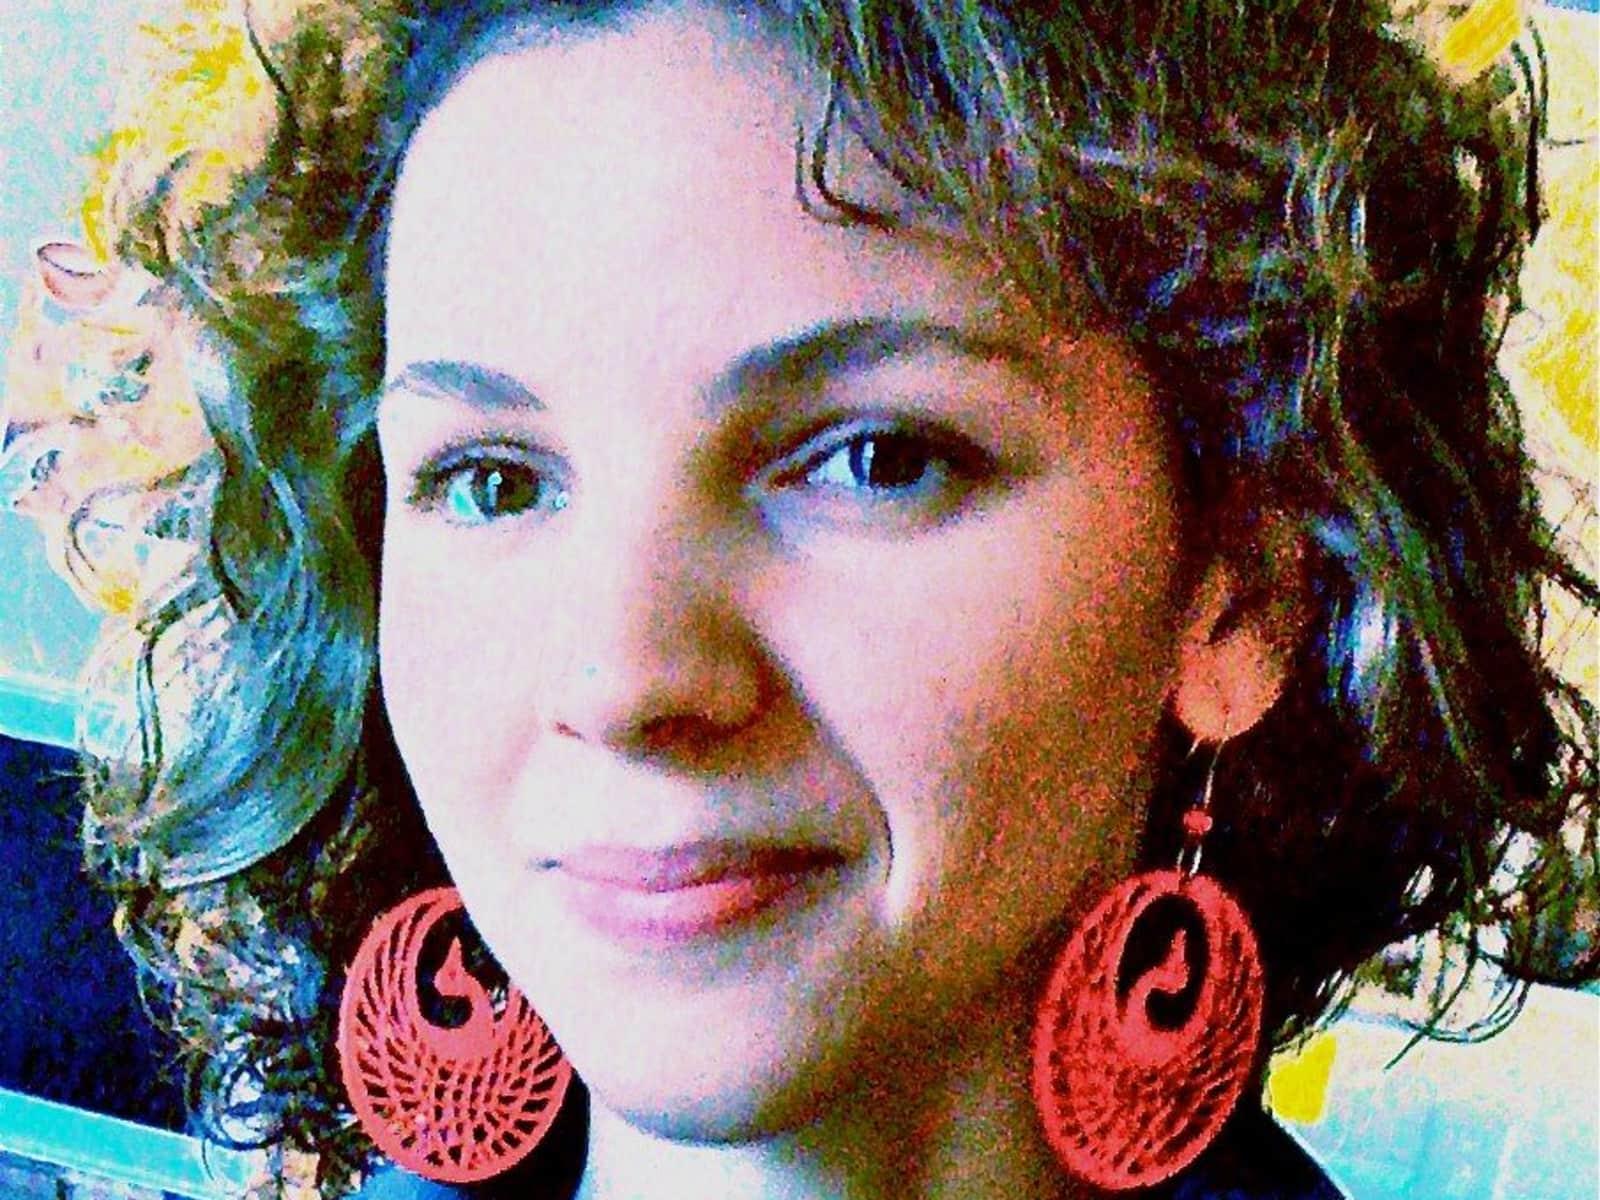 Mia zarina from Northampton, Massachusetts, United States